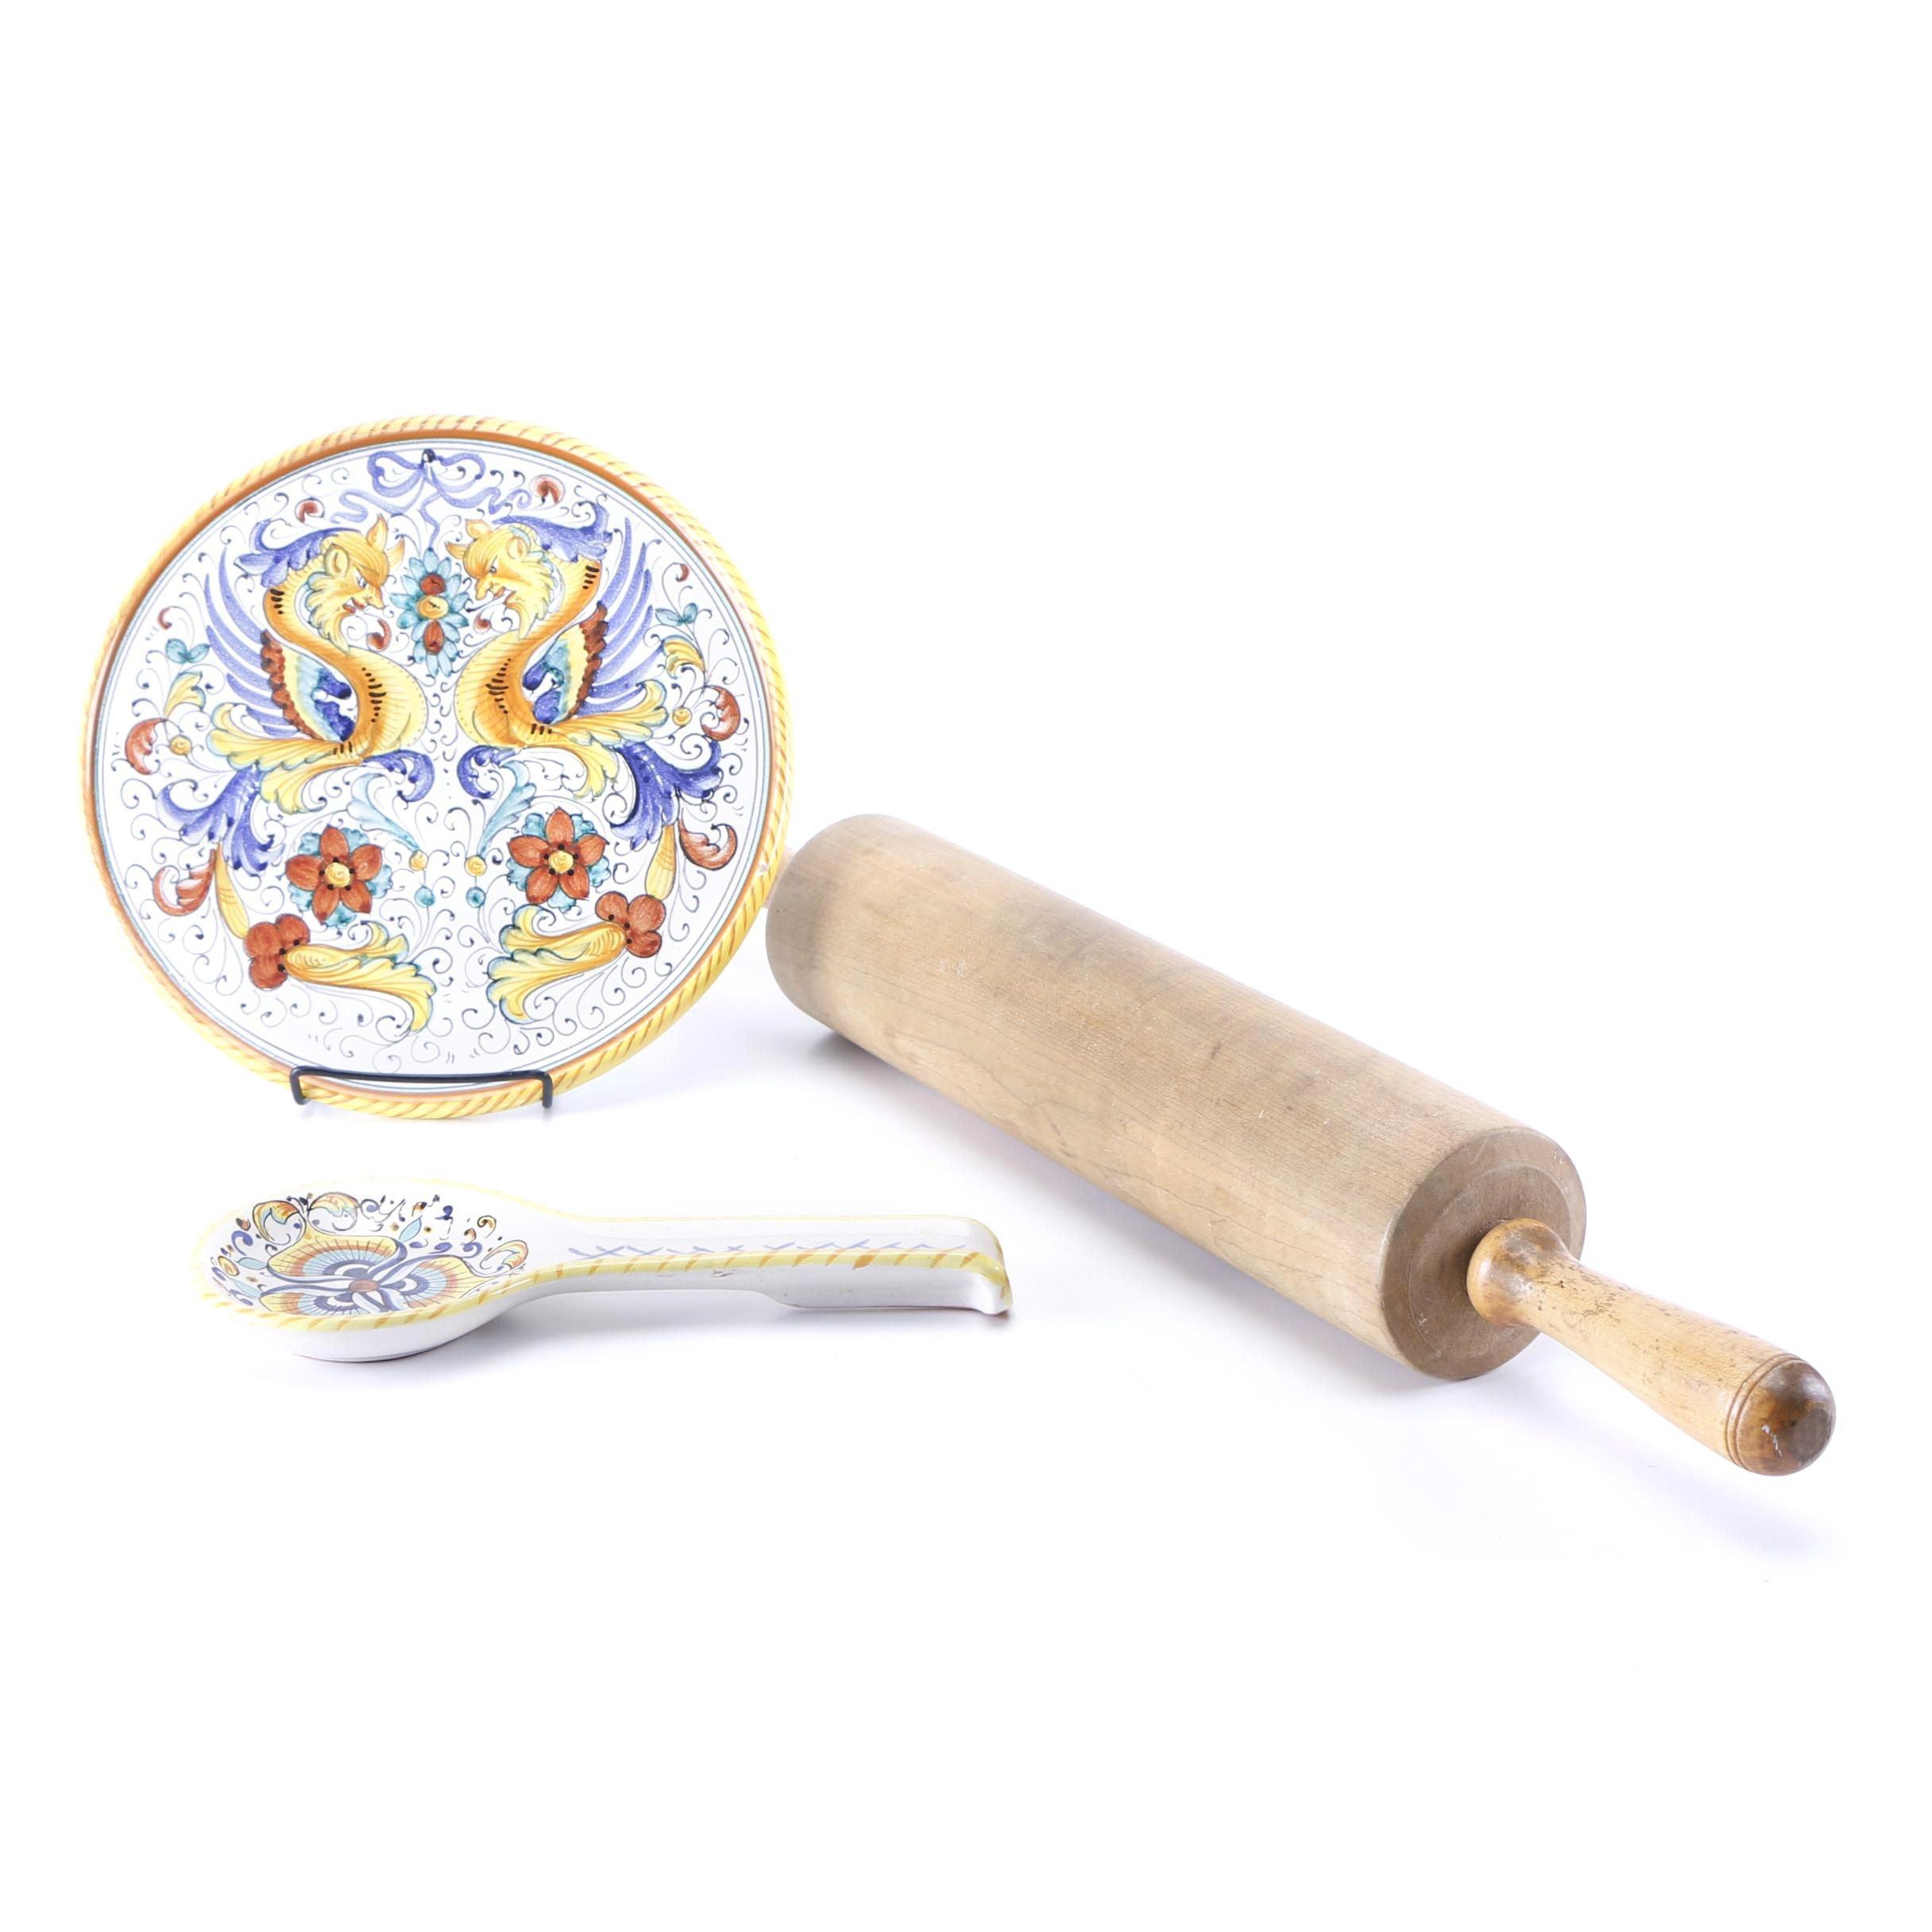 "Deruta Italy ""Raffaellesco"" Faïence Platter with Spoon Rest and Rolling Pin"